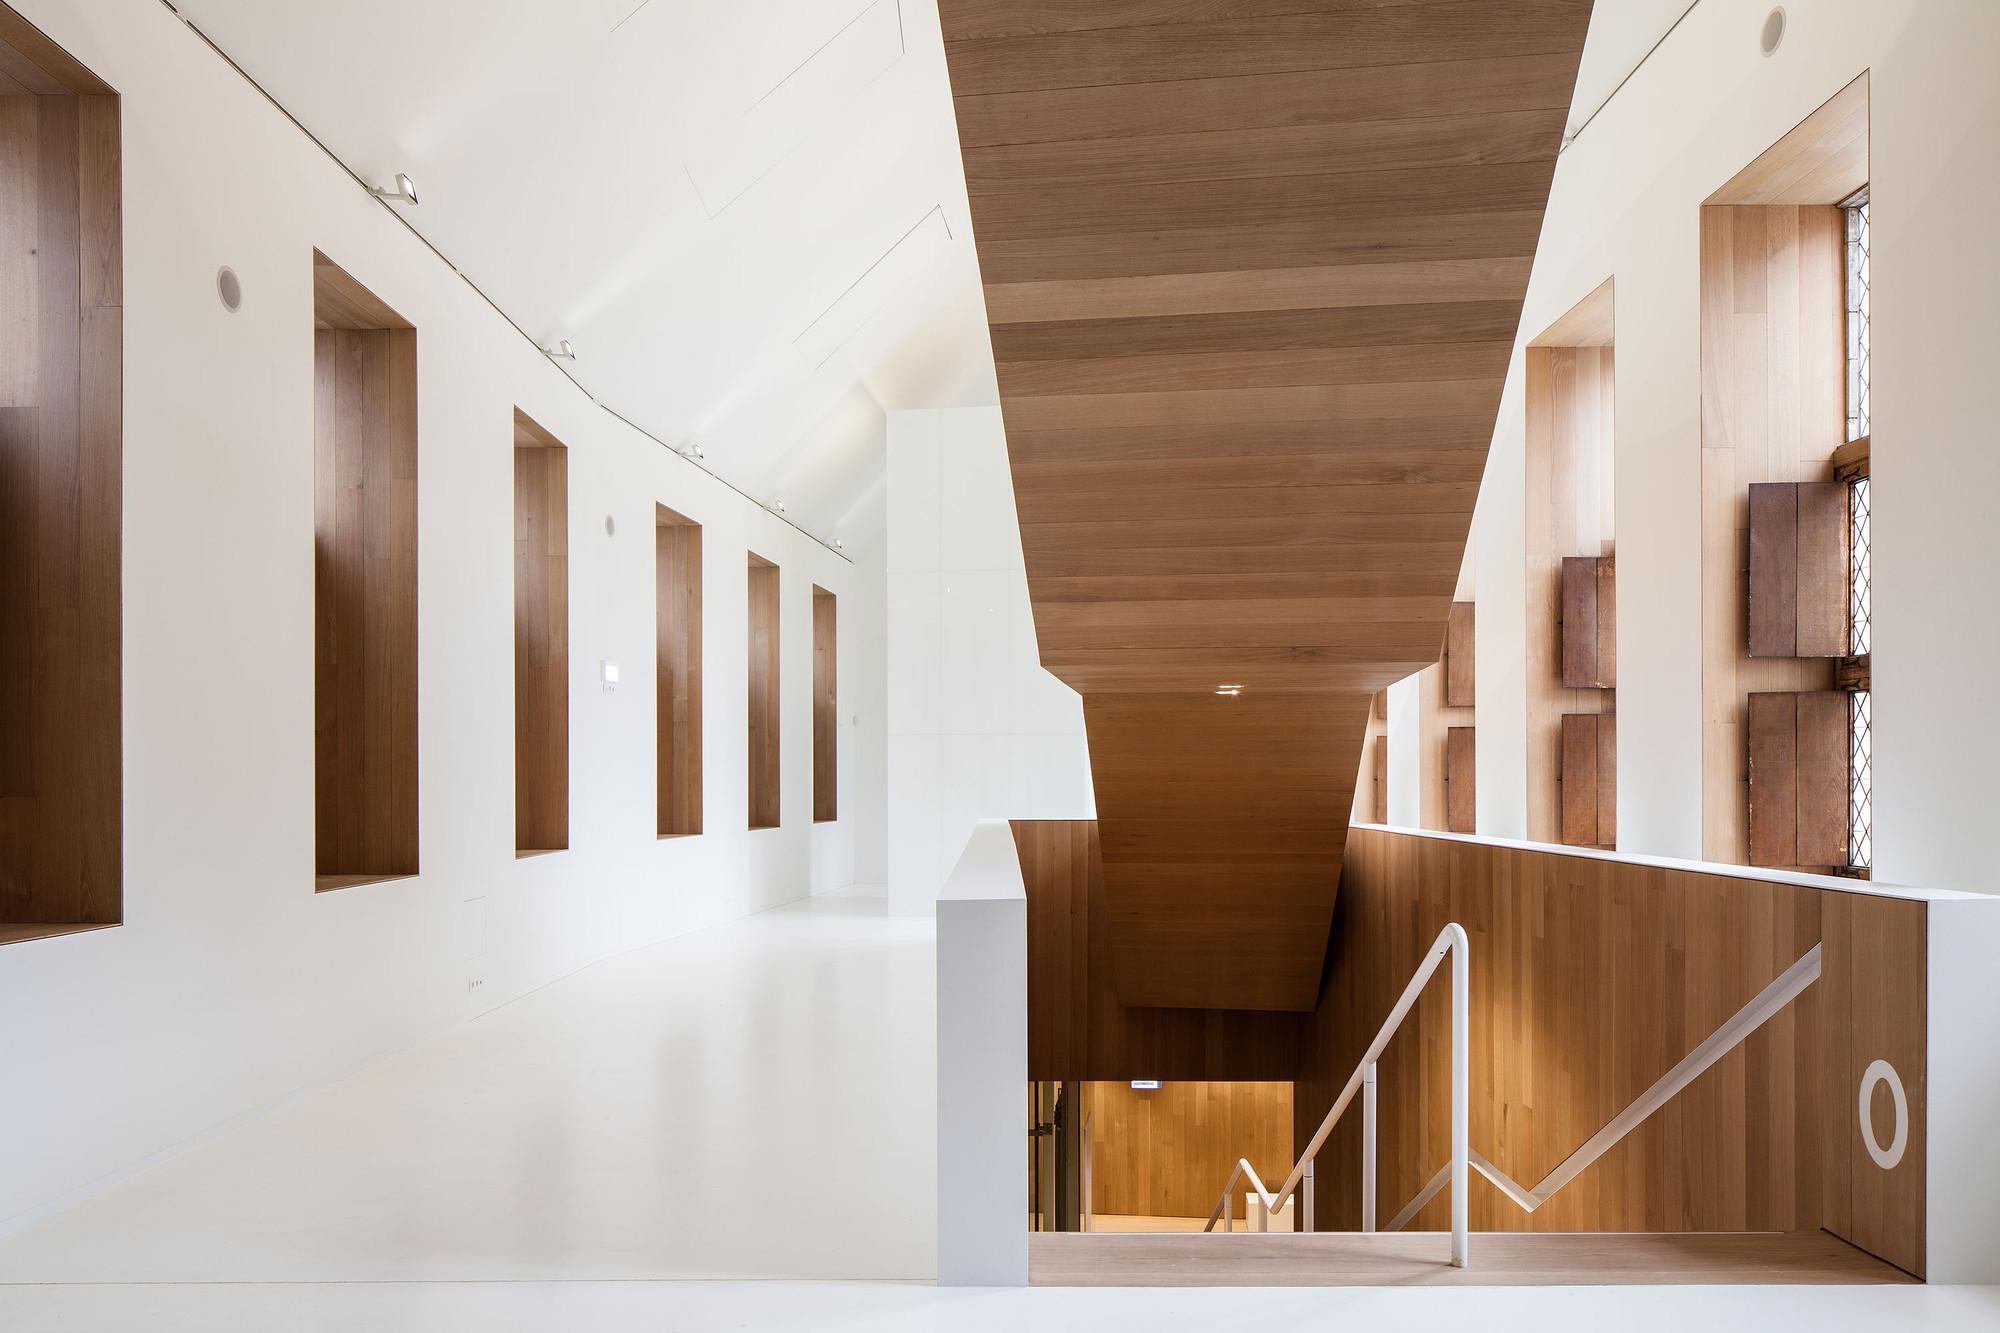 Reforma do 'Stedelijk Museum Hof van Busleyden'  / dmvA architecten  +  Hlc.r architect, © Frederik Vercruysse